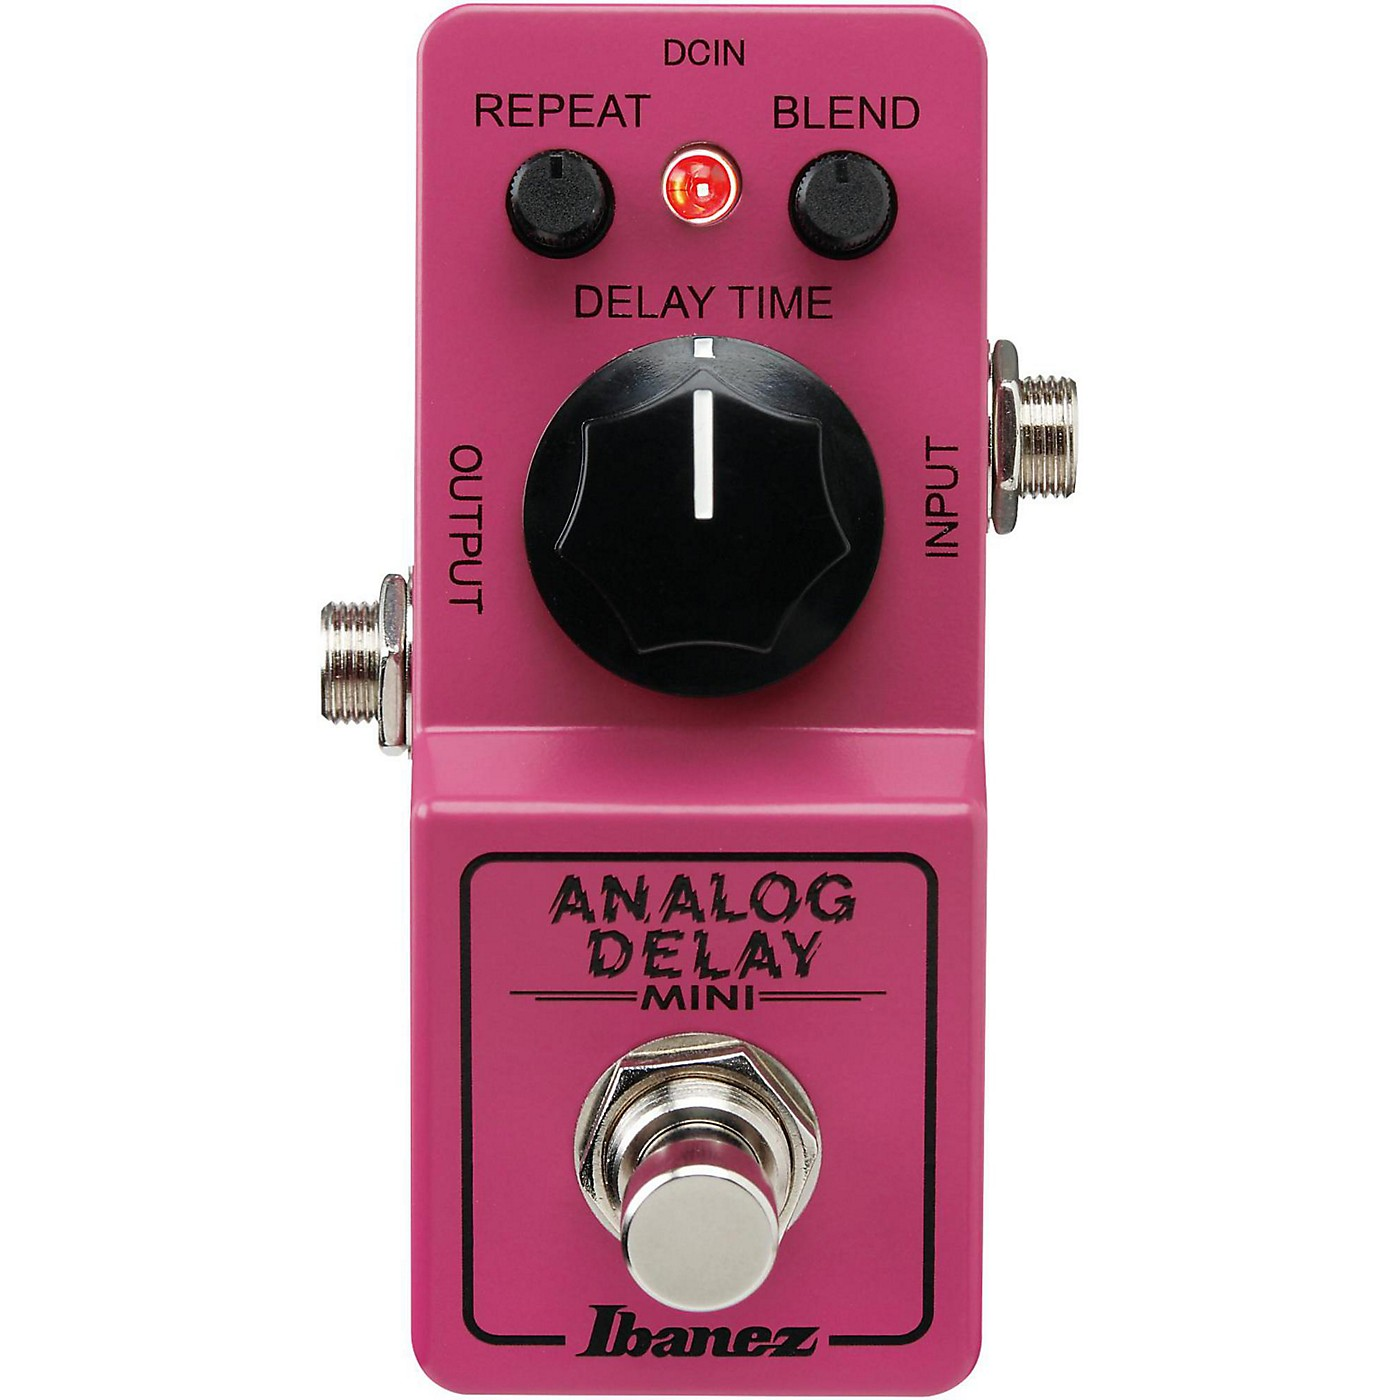 Ibanez Analog Delay Mini Guitar Pedal thumbnail